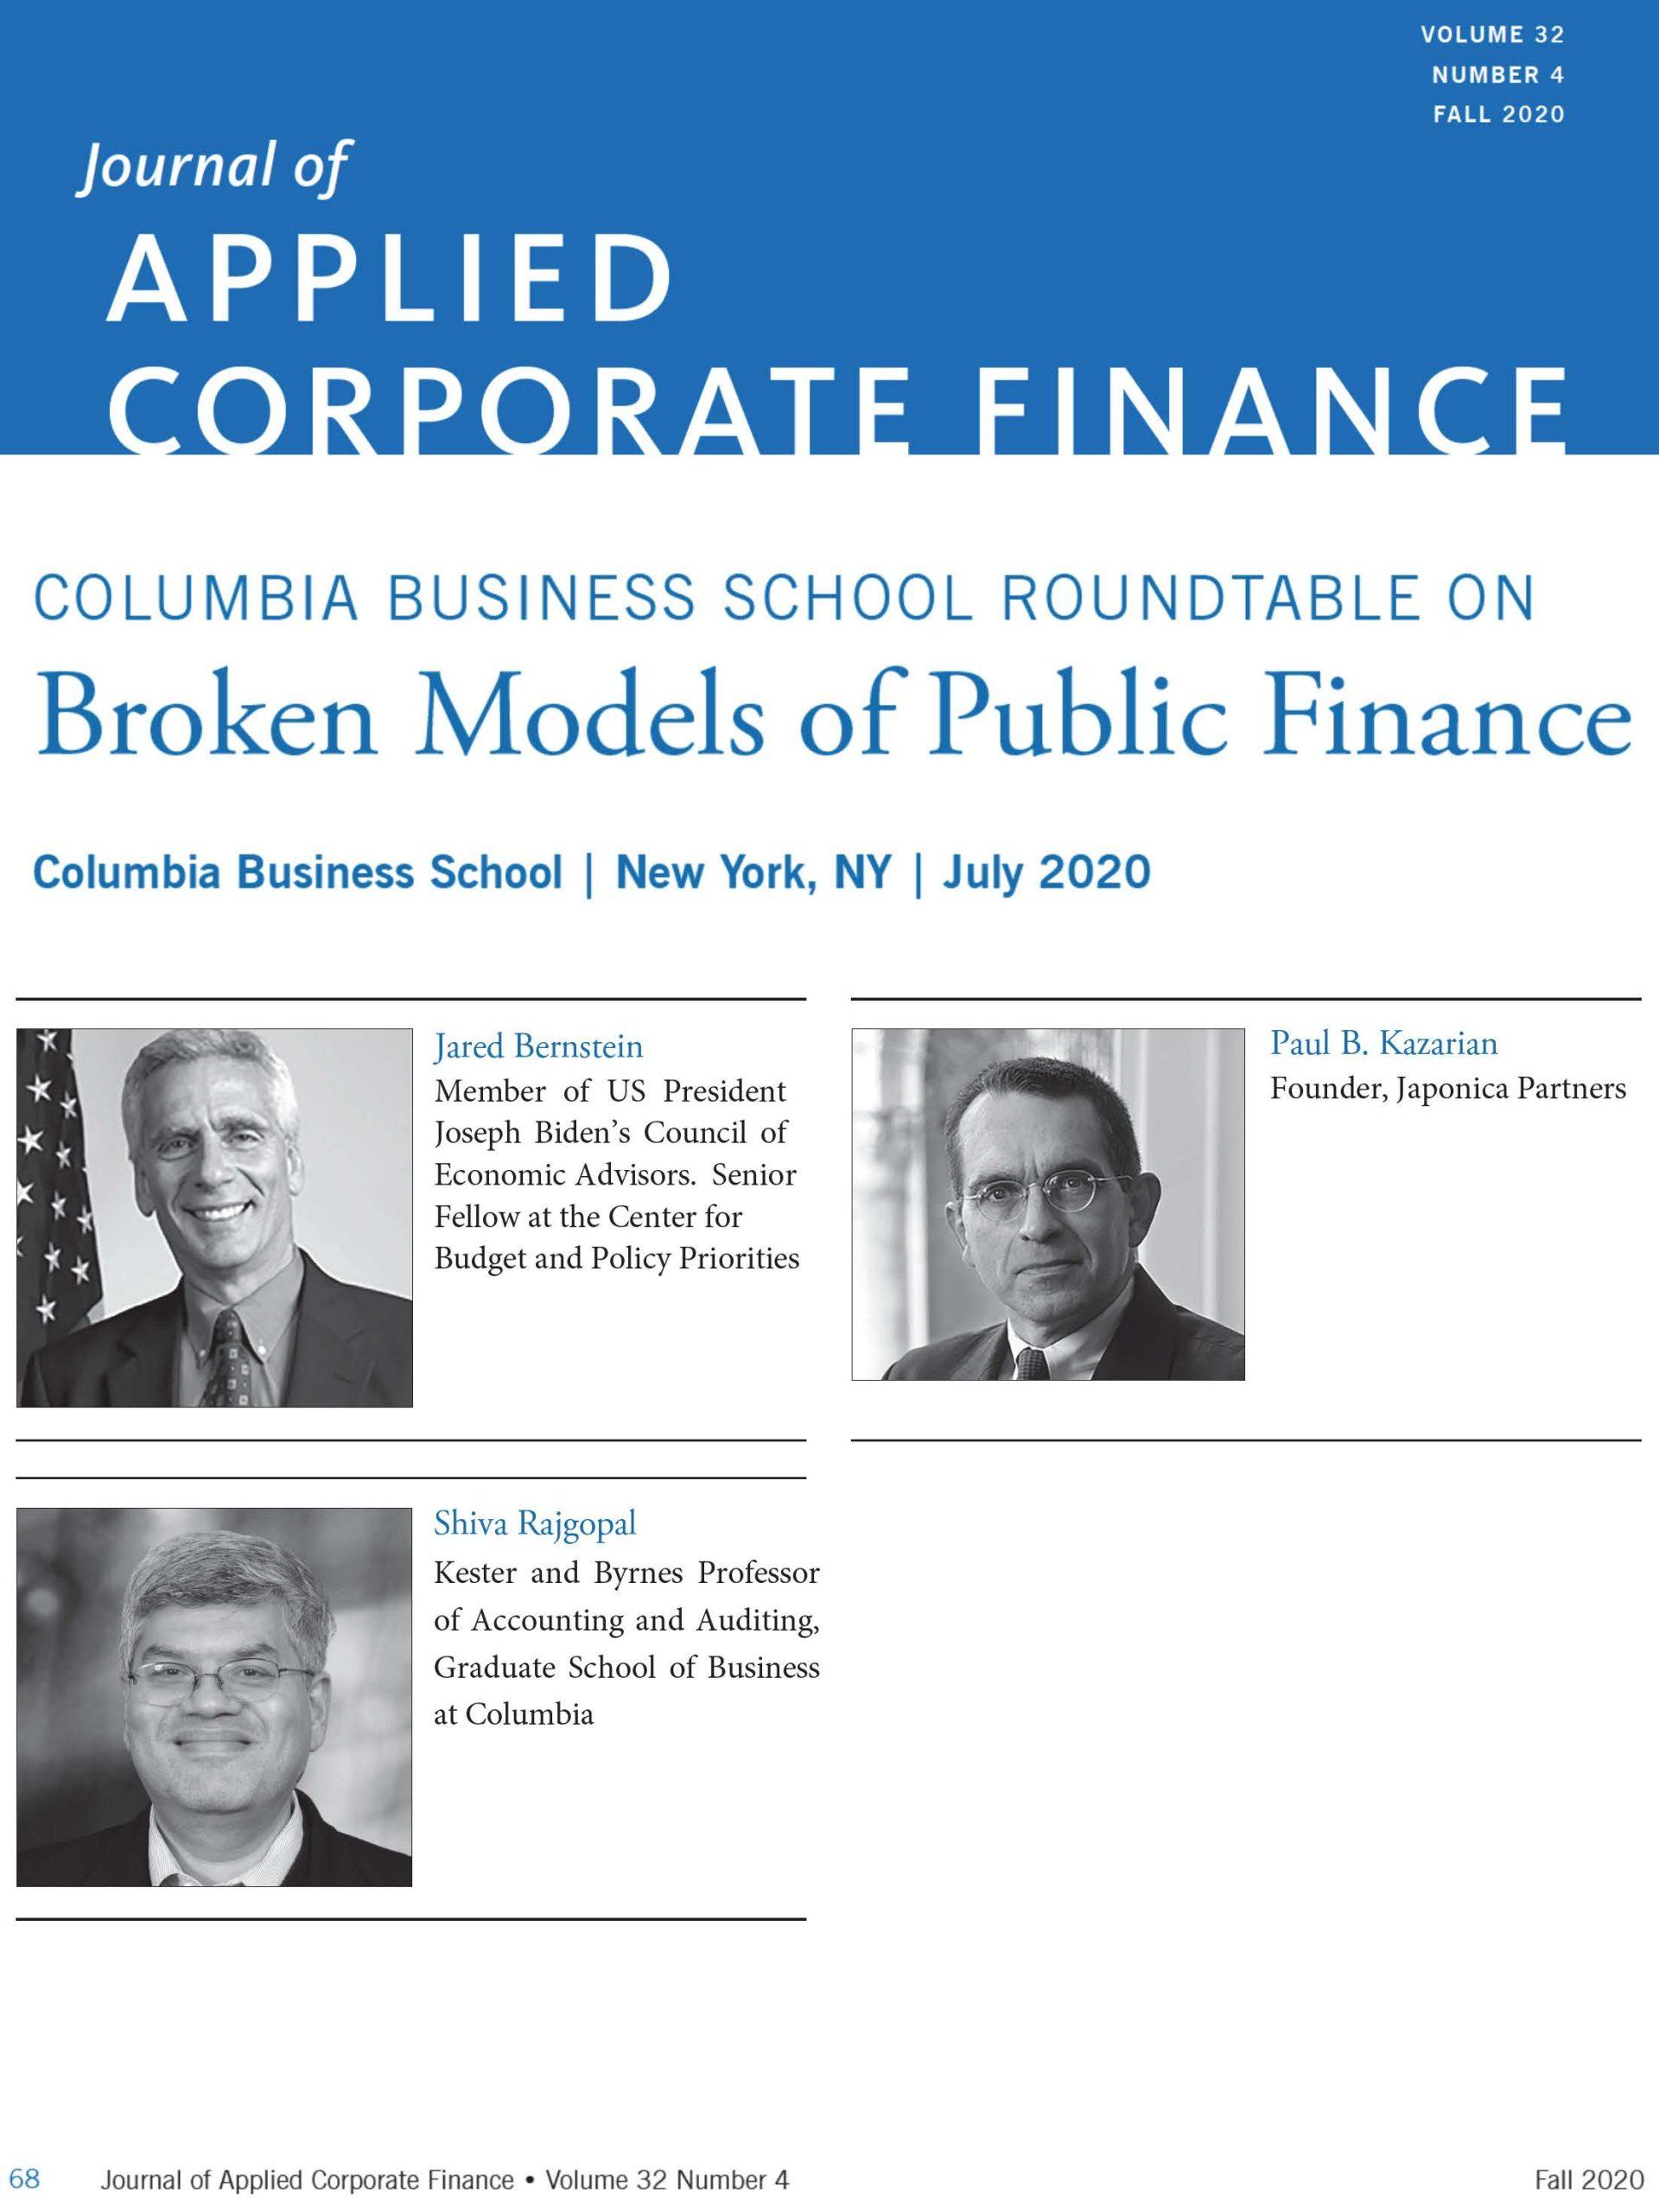 Columbia Business School Roundtable on Broken Models of Public Finance